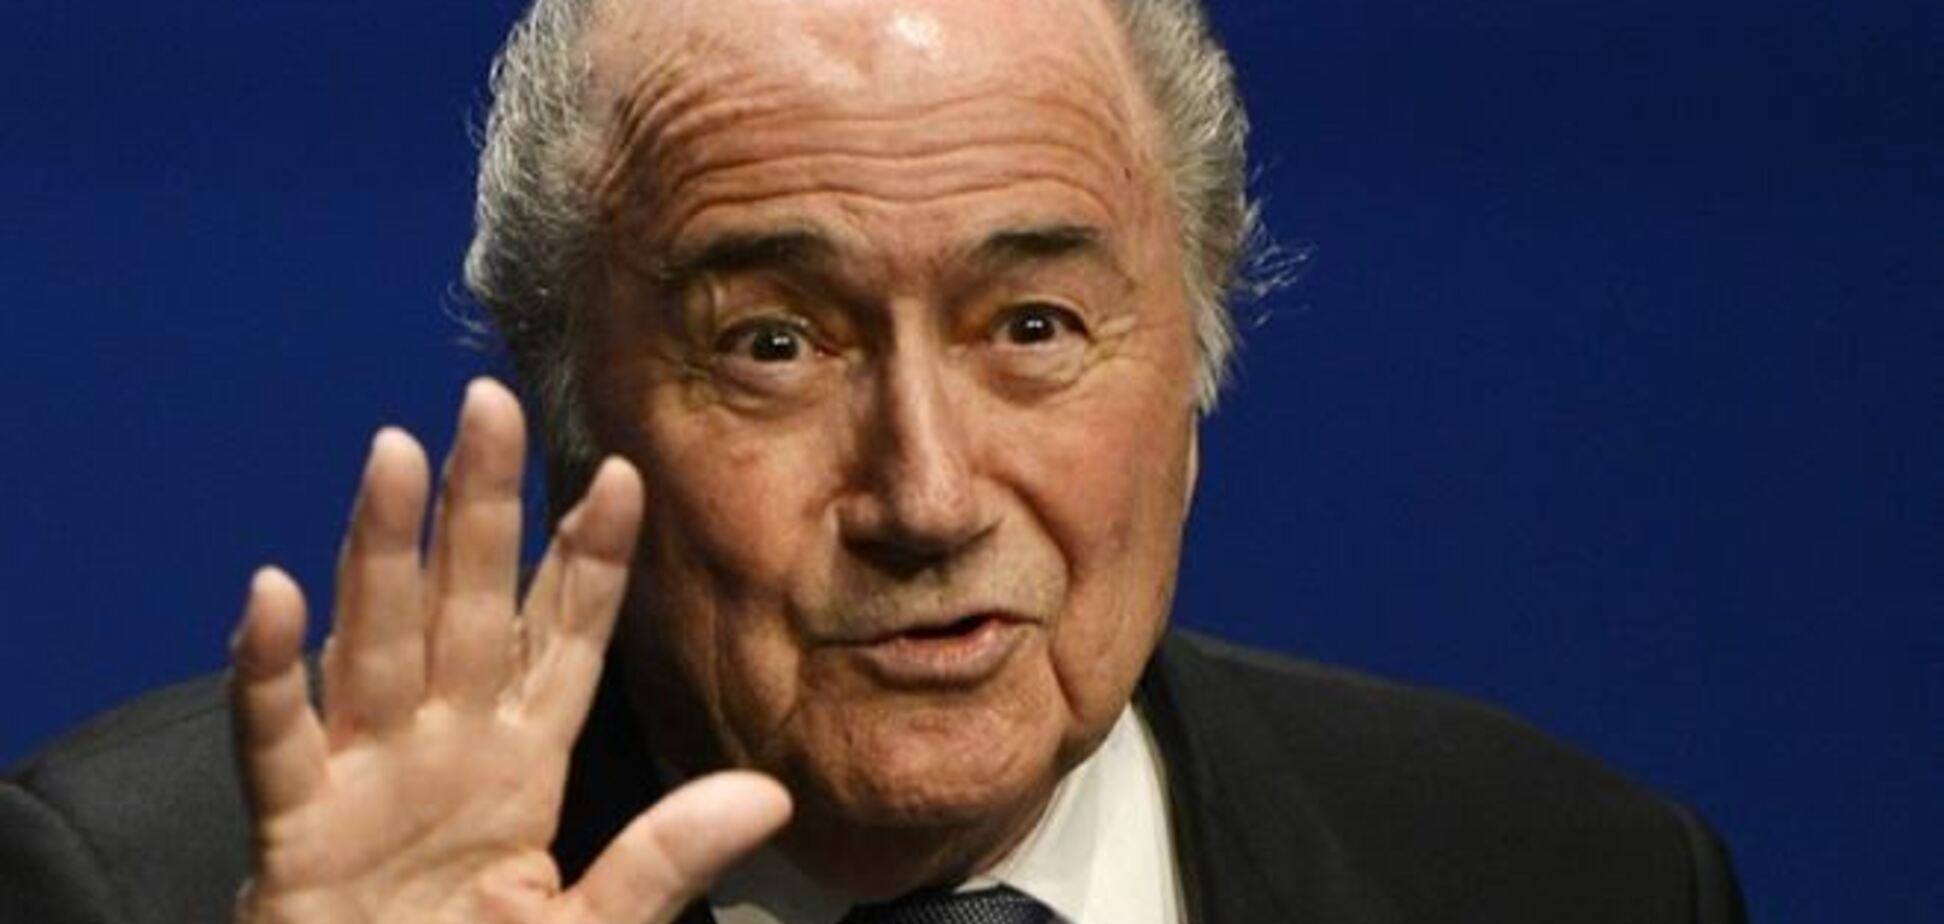 Блаттер намерен в пятый раз баллотироваться на пост президента ФИФА